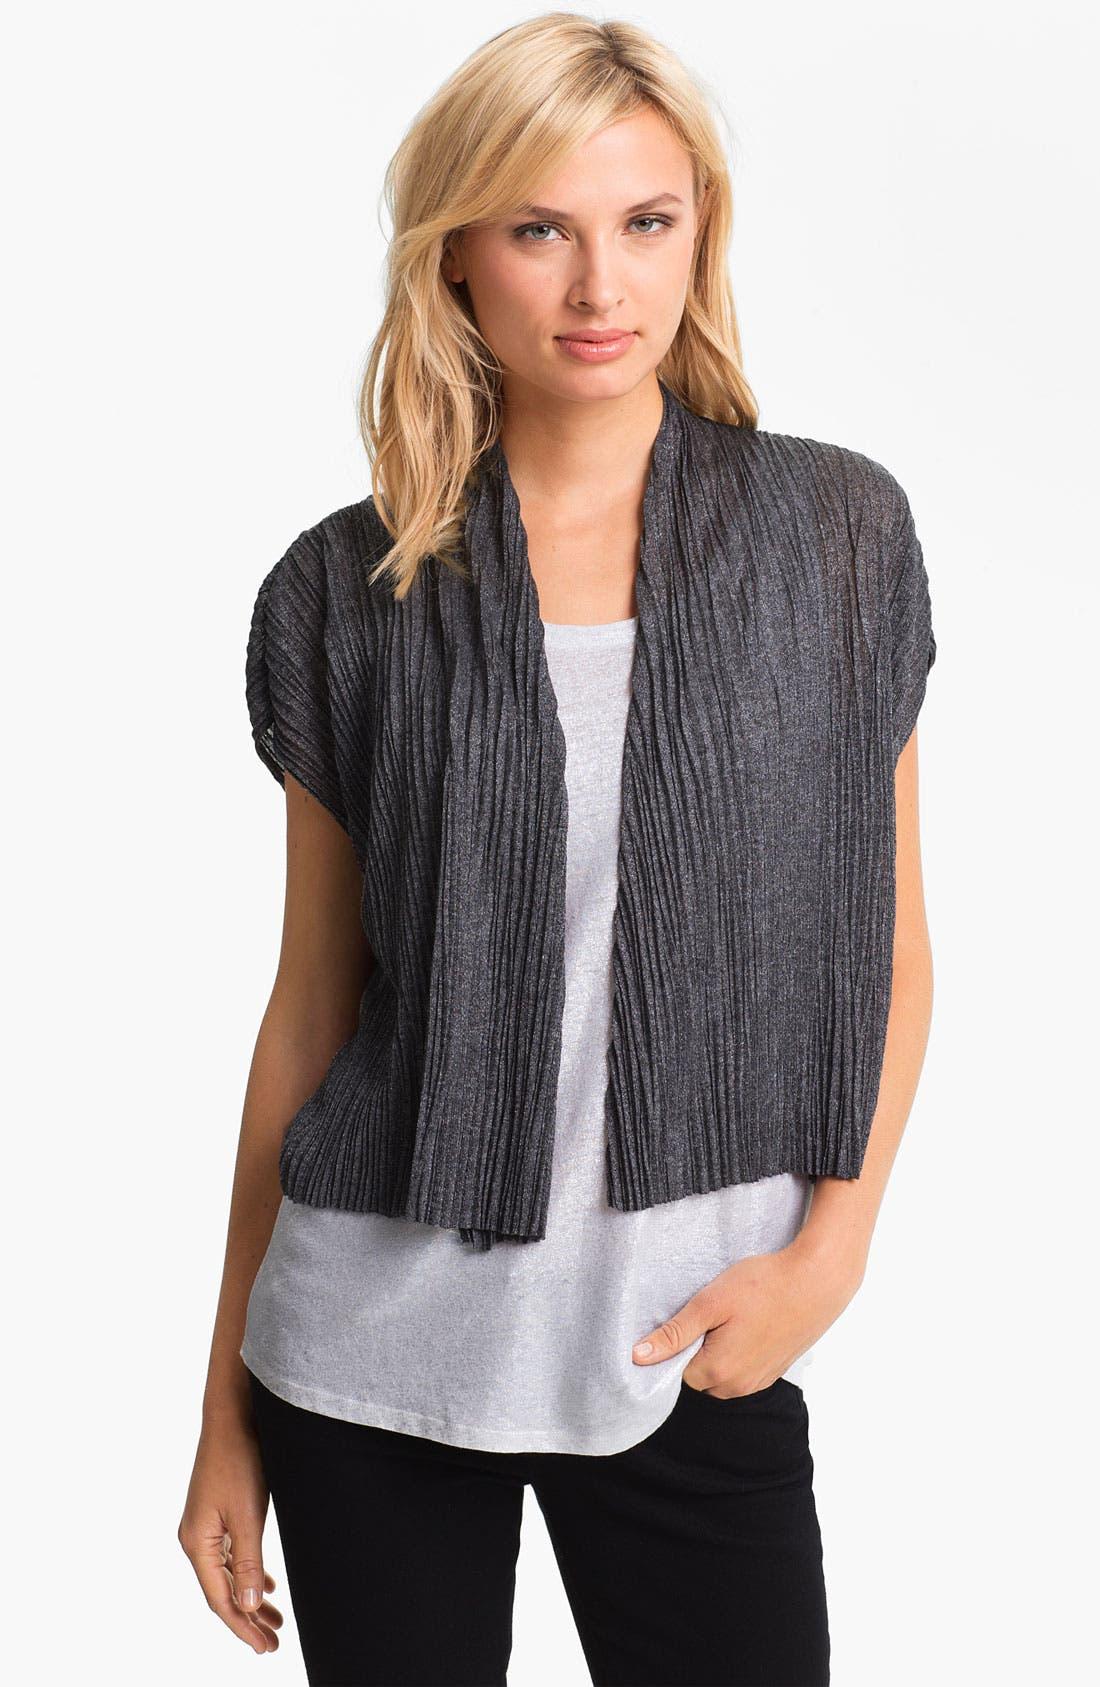 Alternate Image 1 Selected - Eileen Fisher Crinkled Short Sleeve Cardigan (Petite)